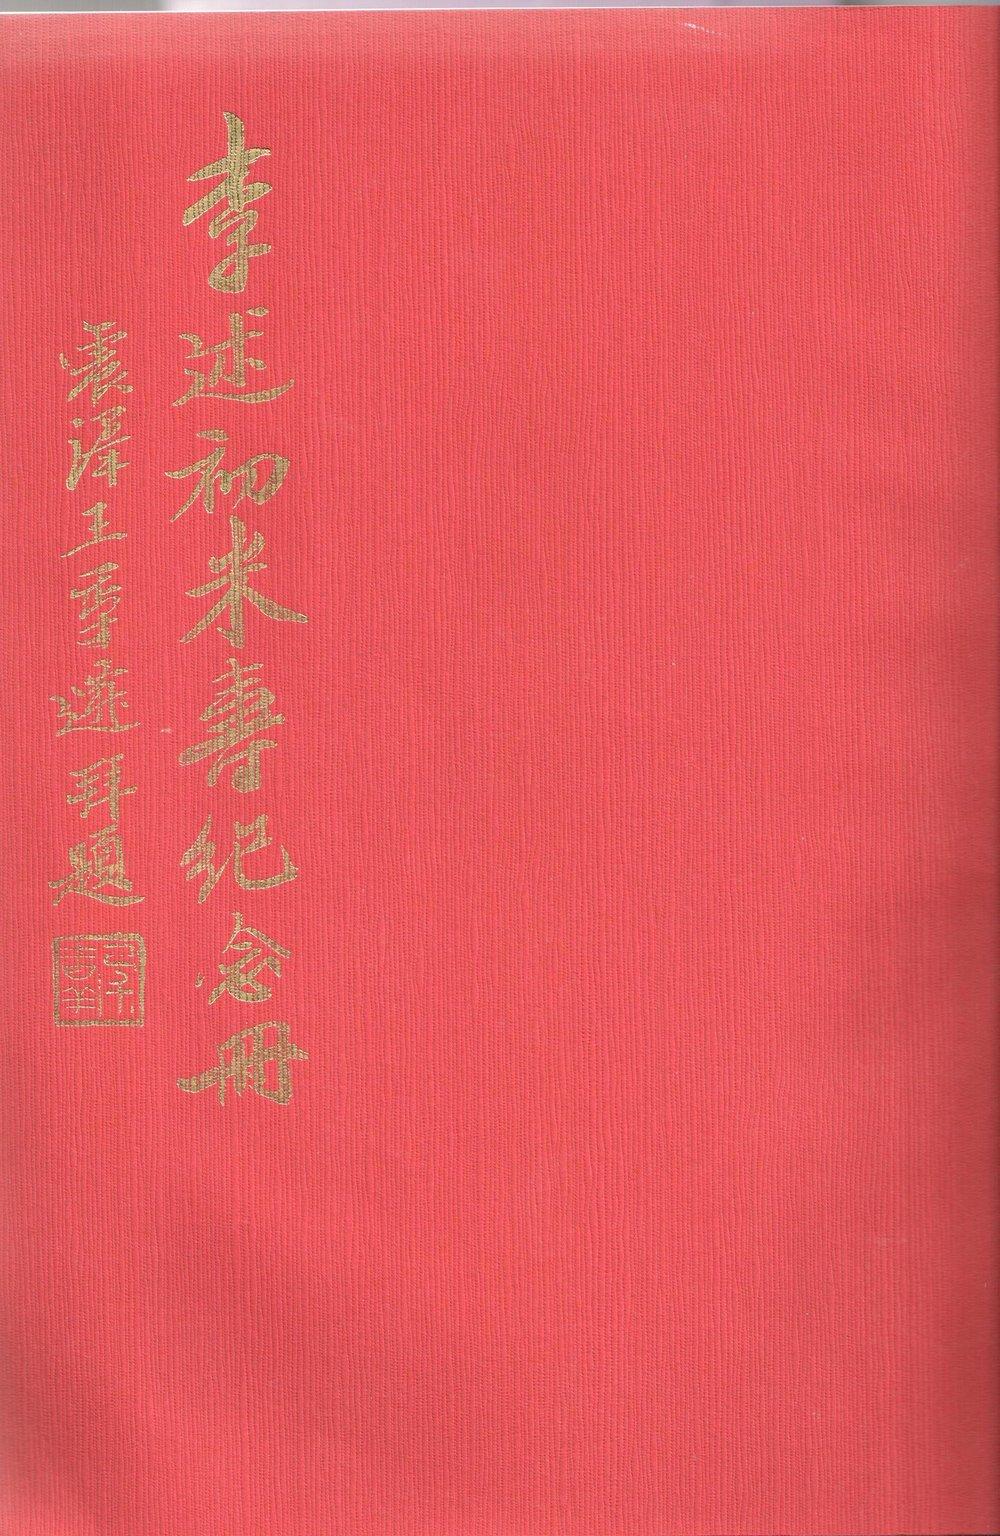 Redbook cover.jpg